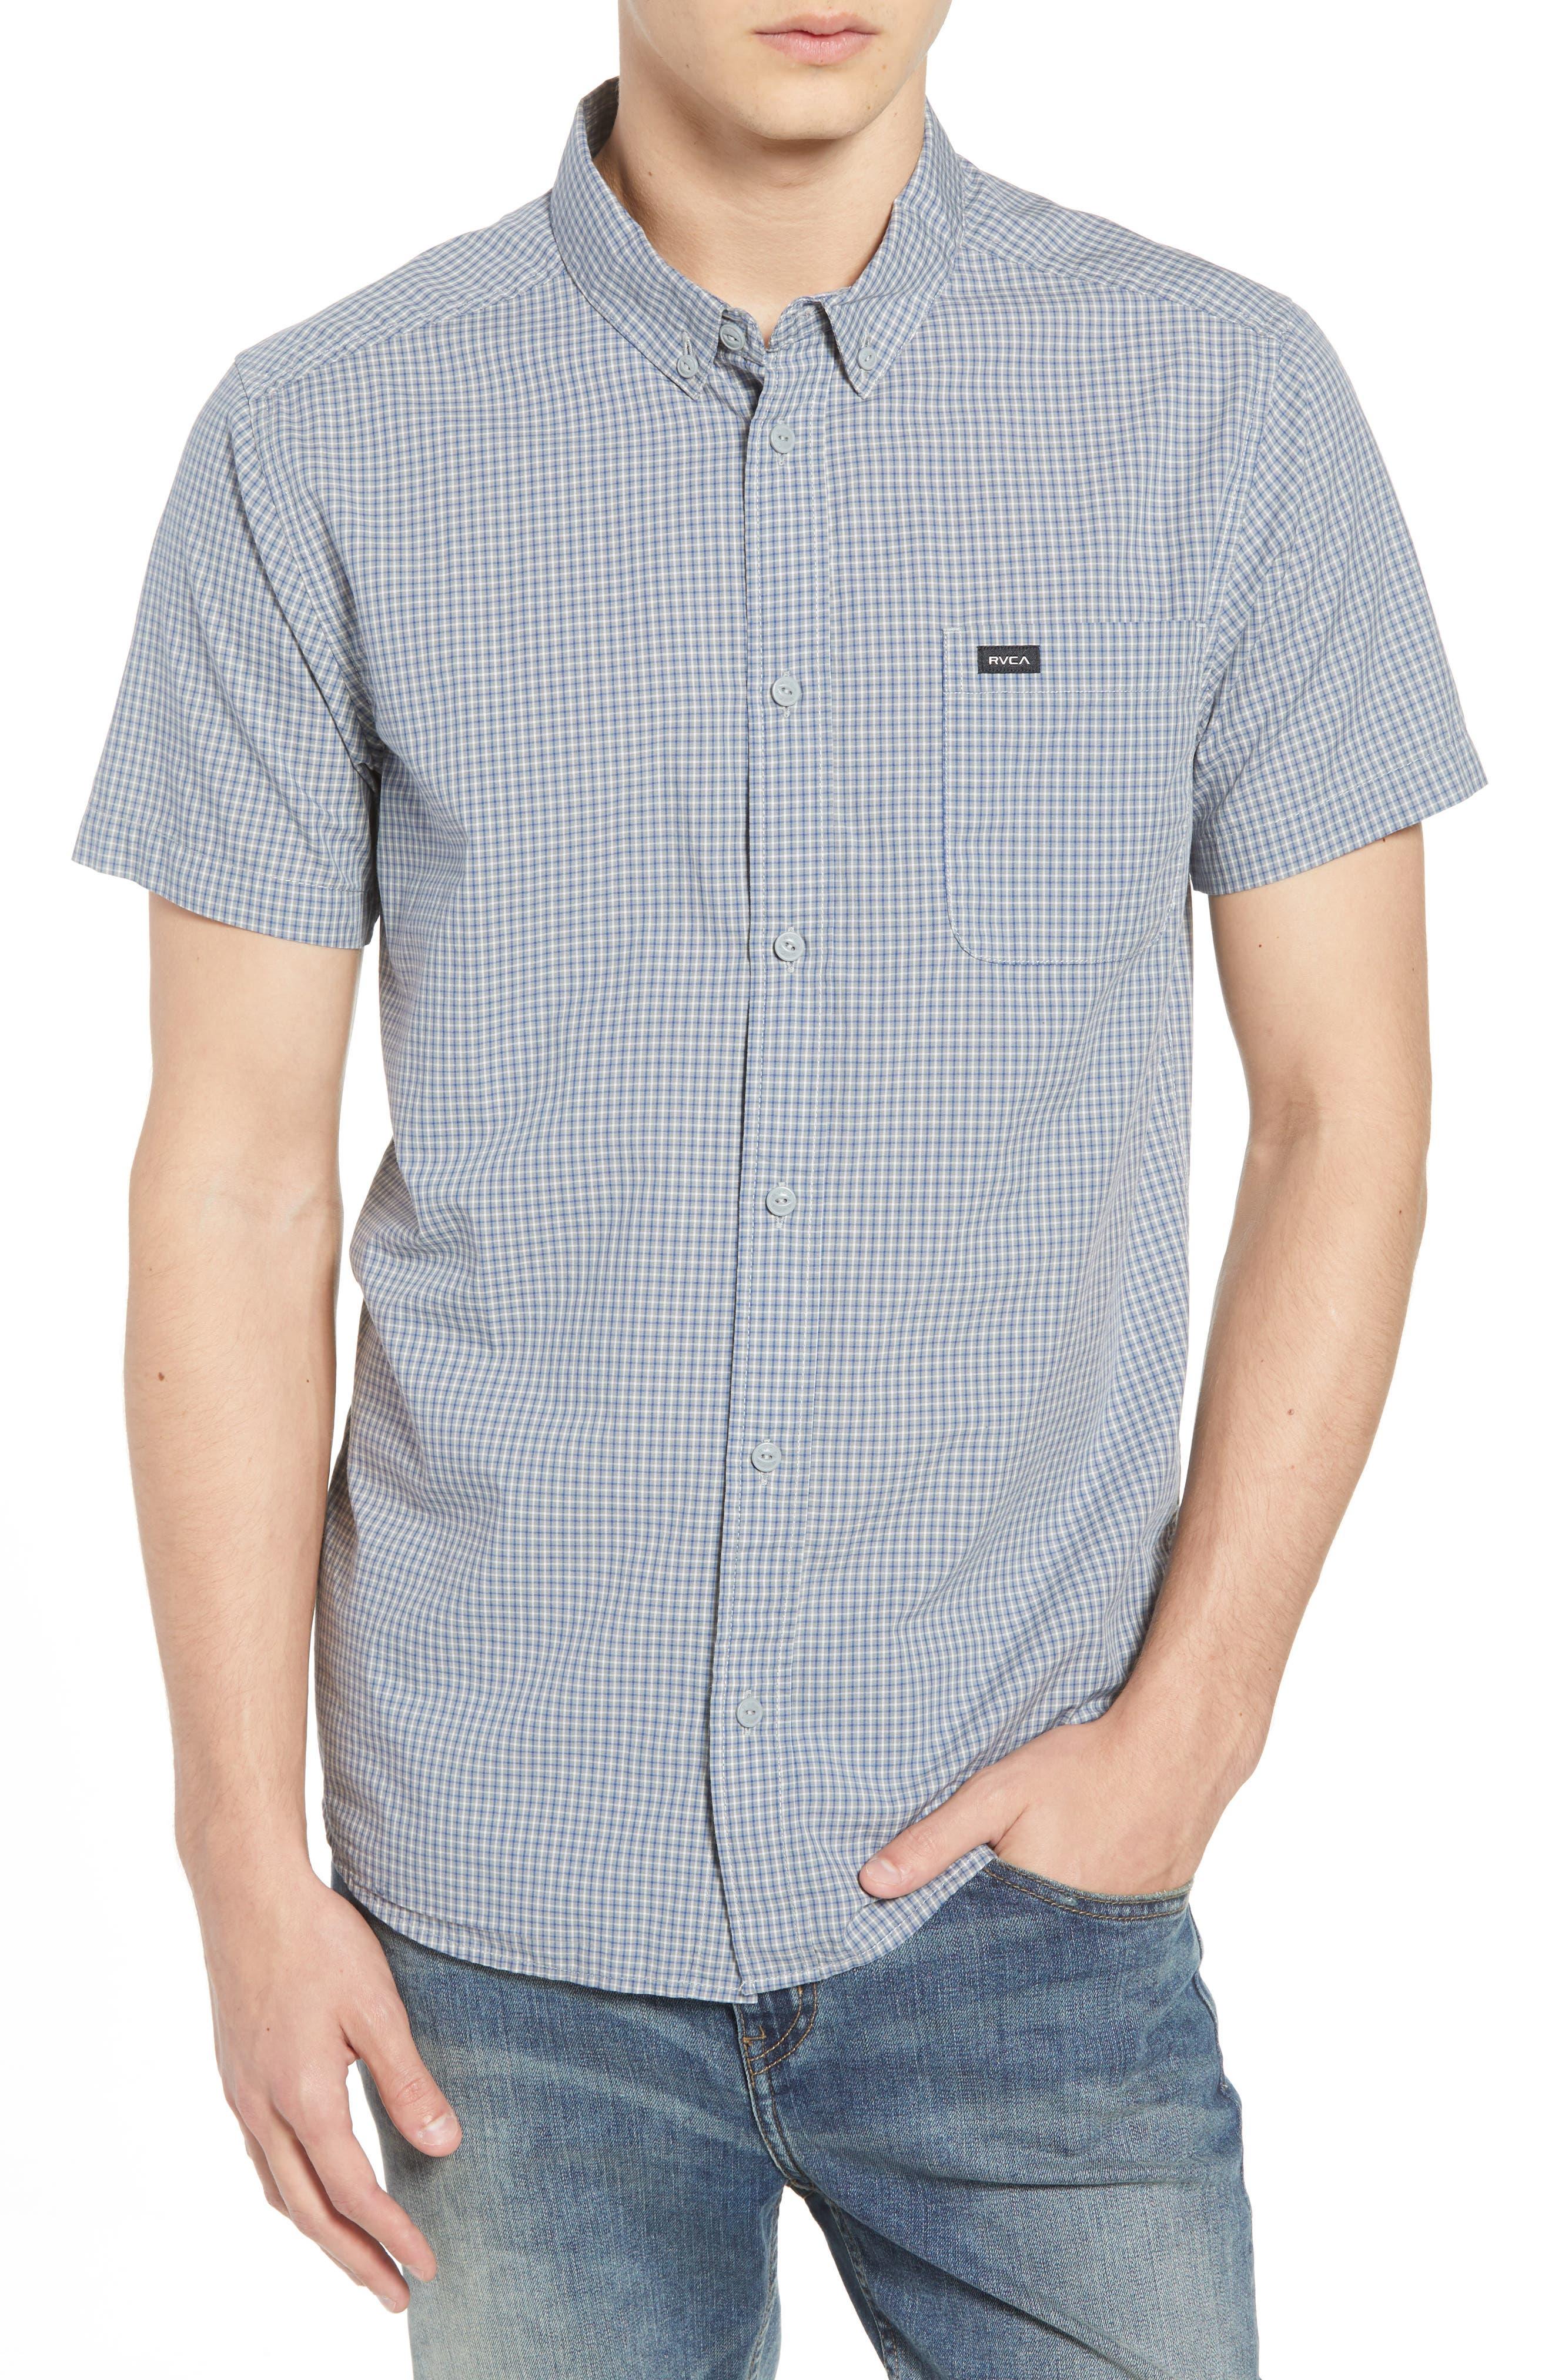 Staple Woven Shirt,                         Main,                         color, 026